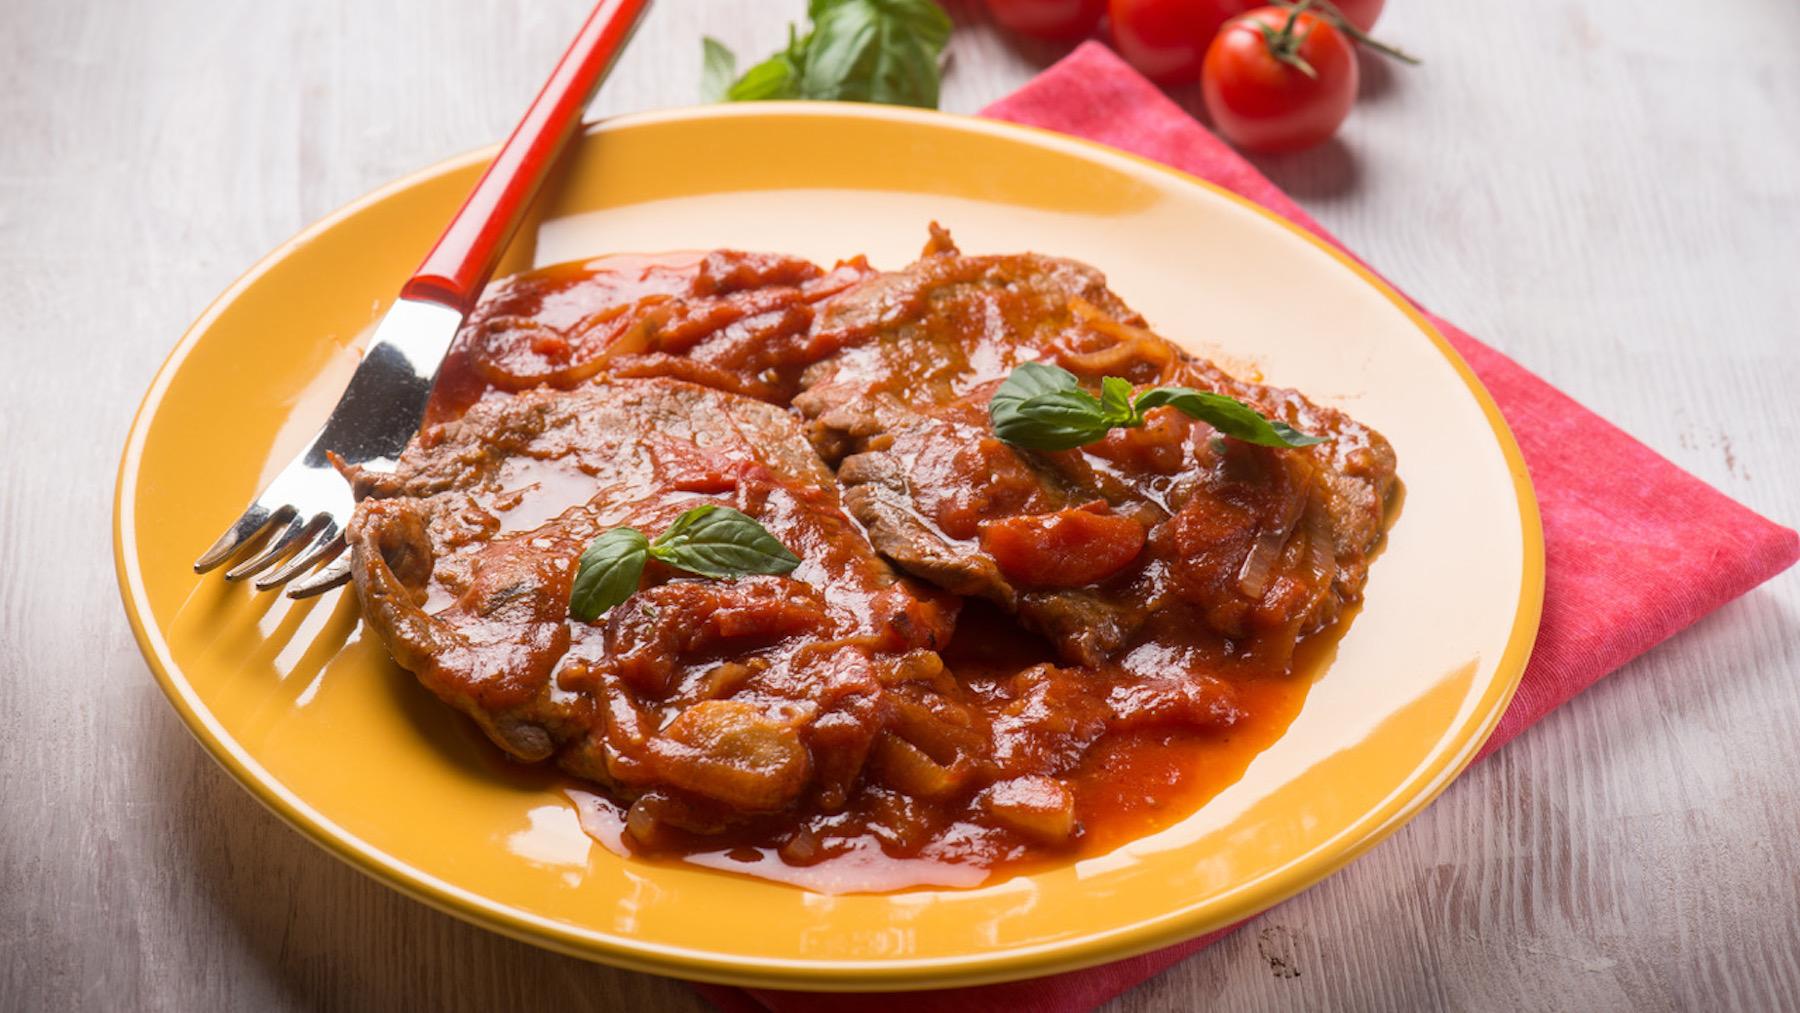 Carne alla peperonata